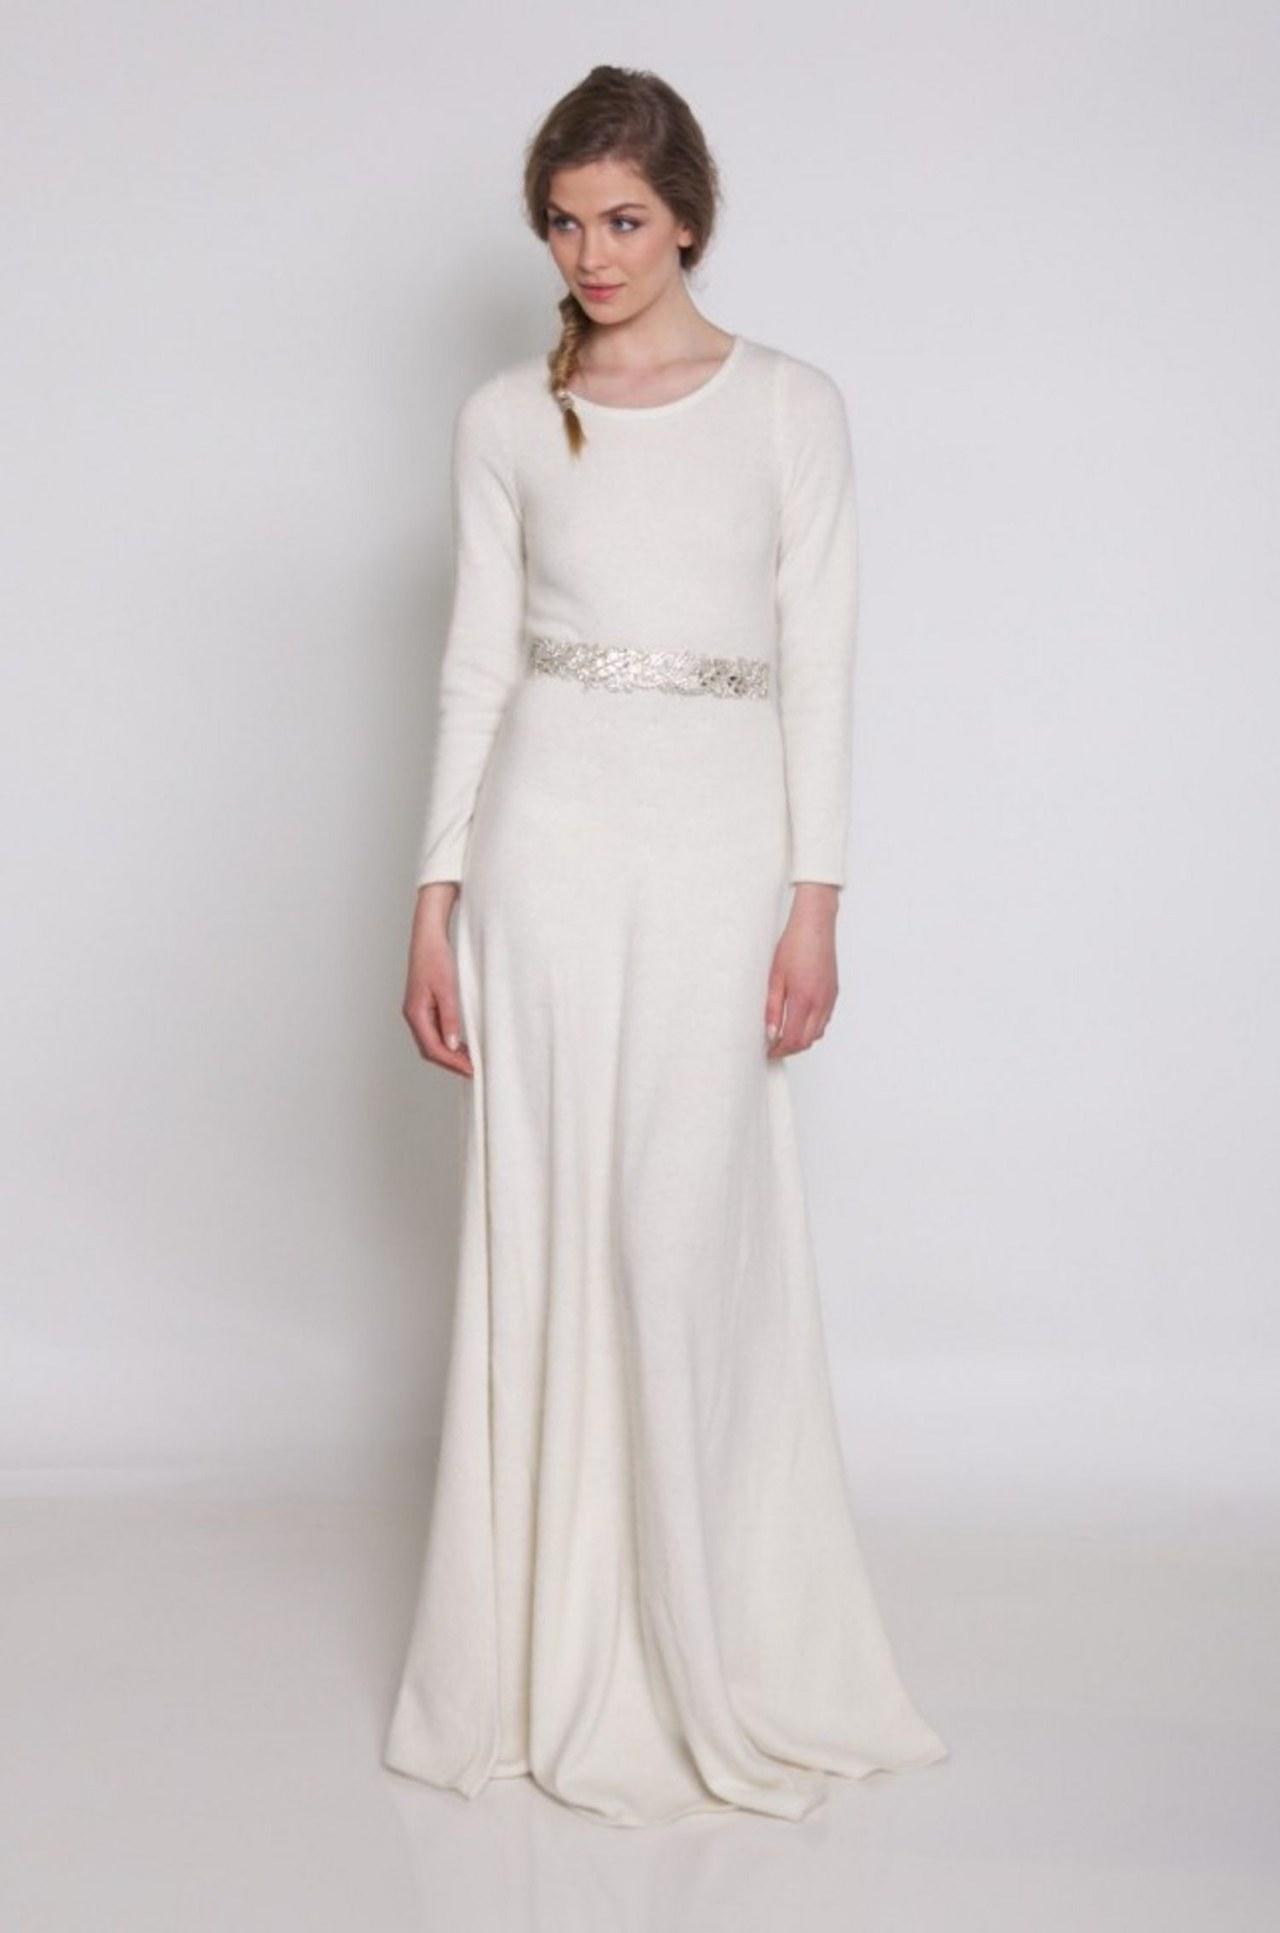 1 winter wedding dresses 1119 mqptifx